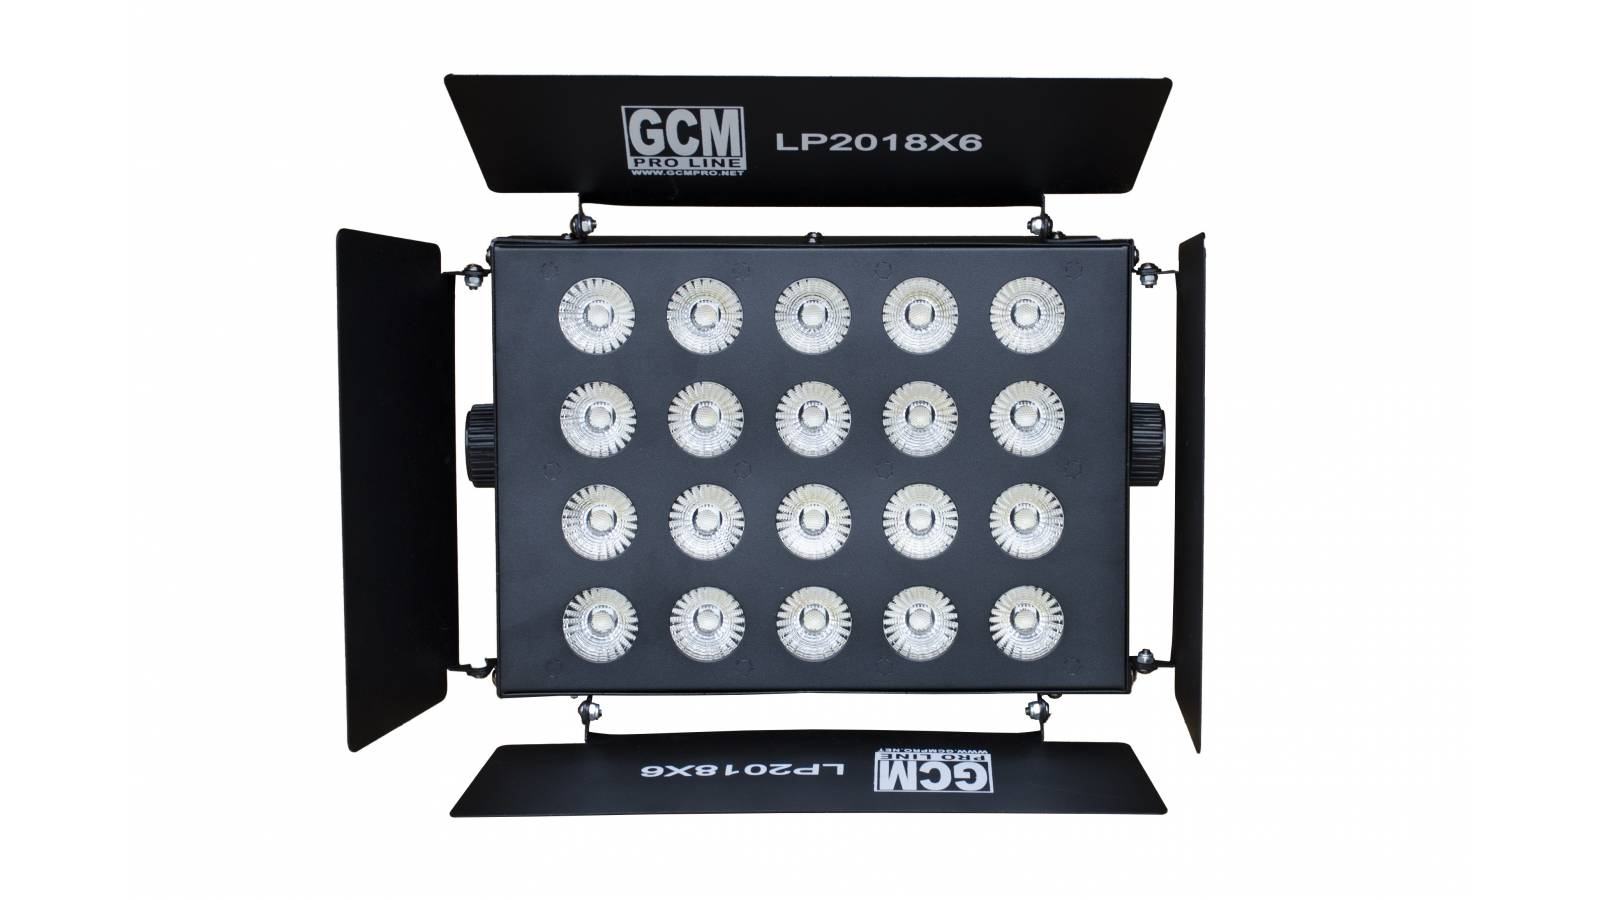 Bañador 20 LEDS x 18W RGBWA+UV - LP2018 GCM Pro Line